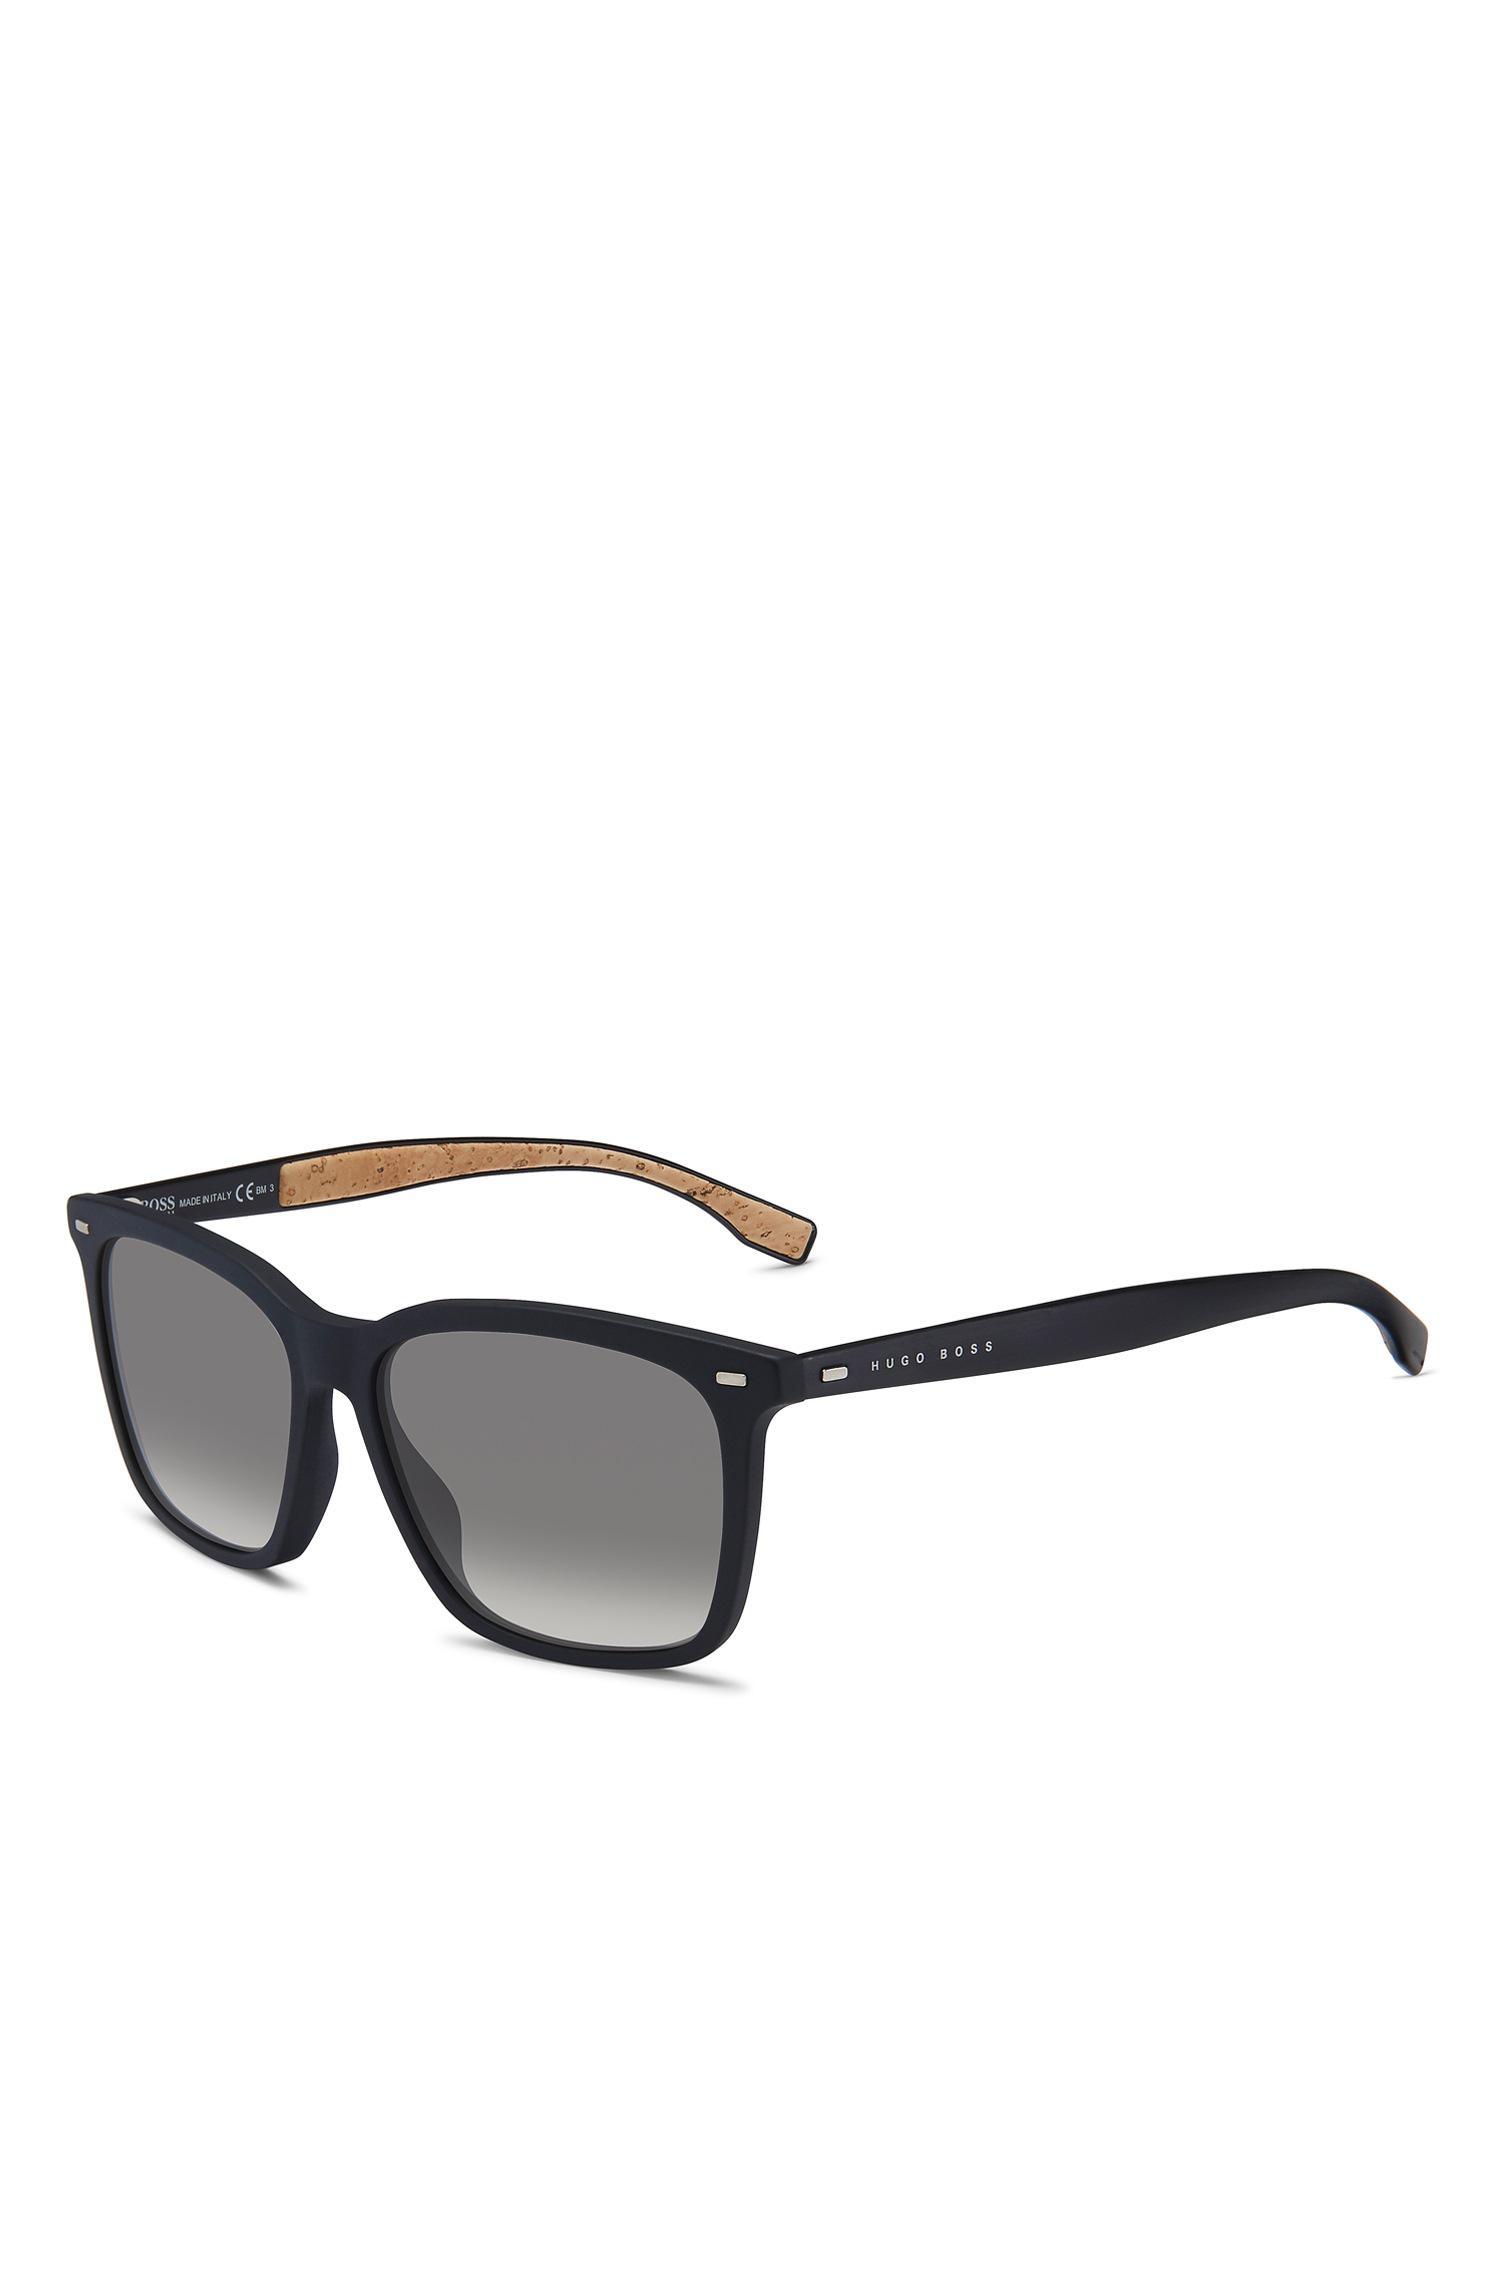 70e5383c7f Lyst - BOSS Black Acetate Rectangular Sunglasses